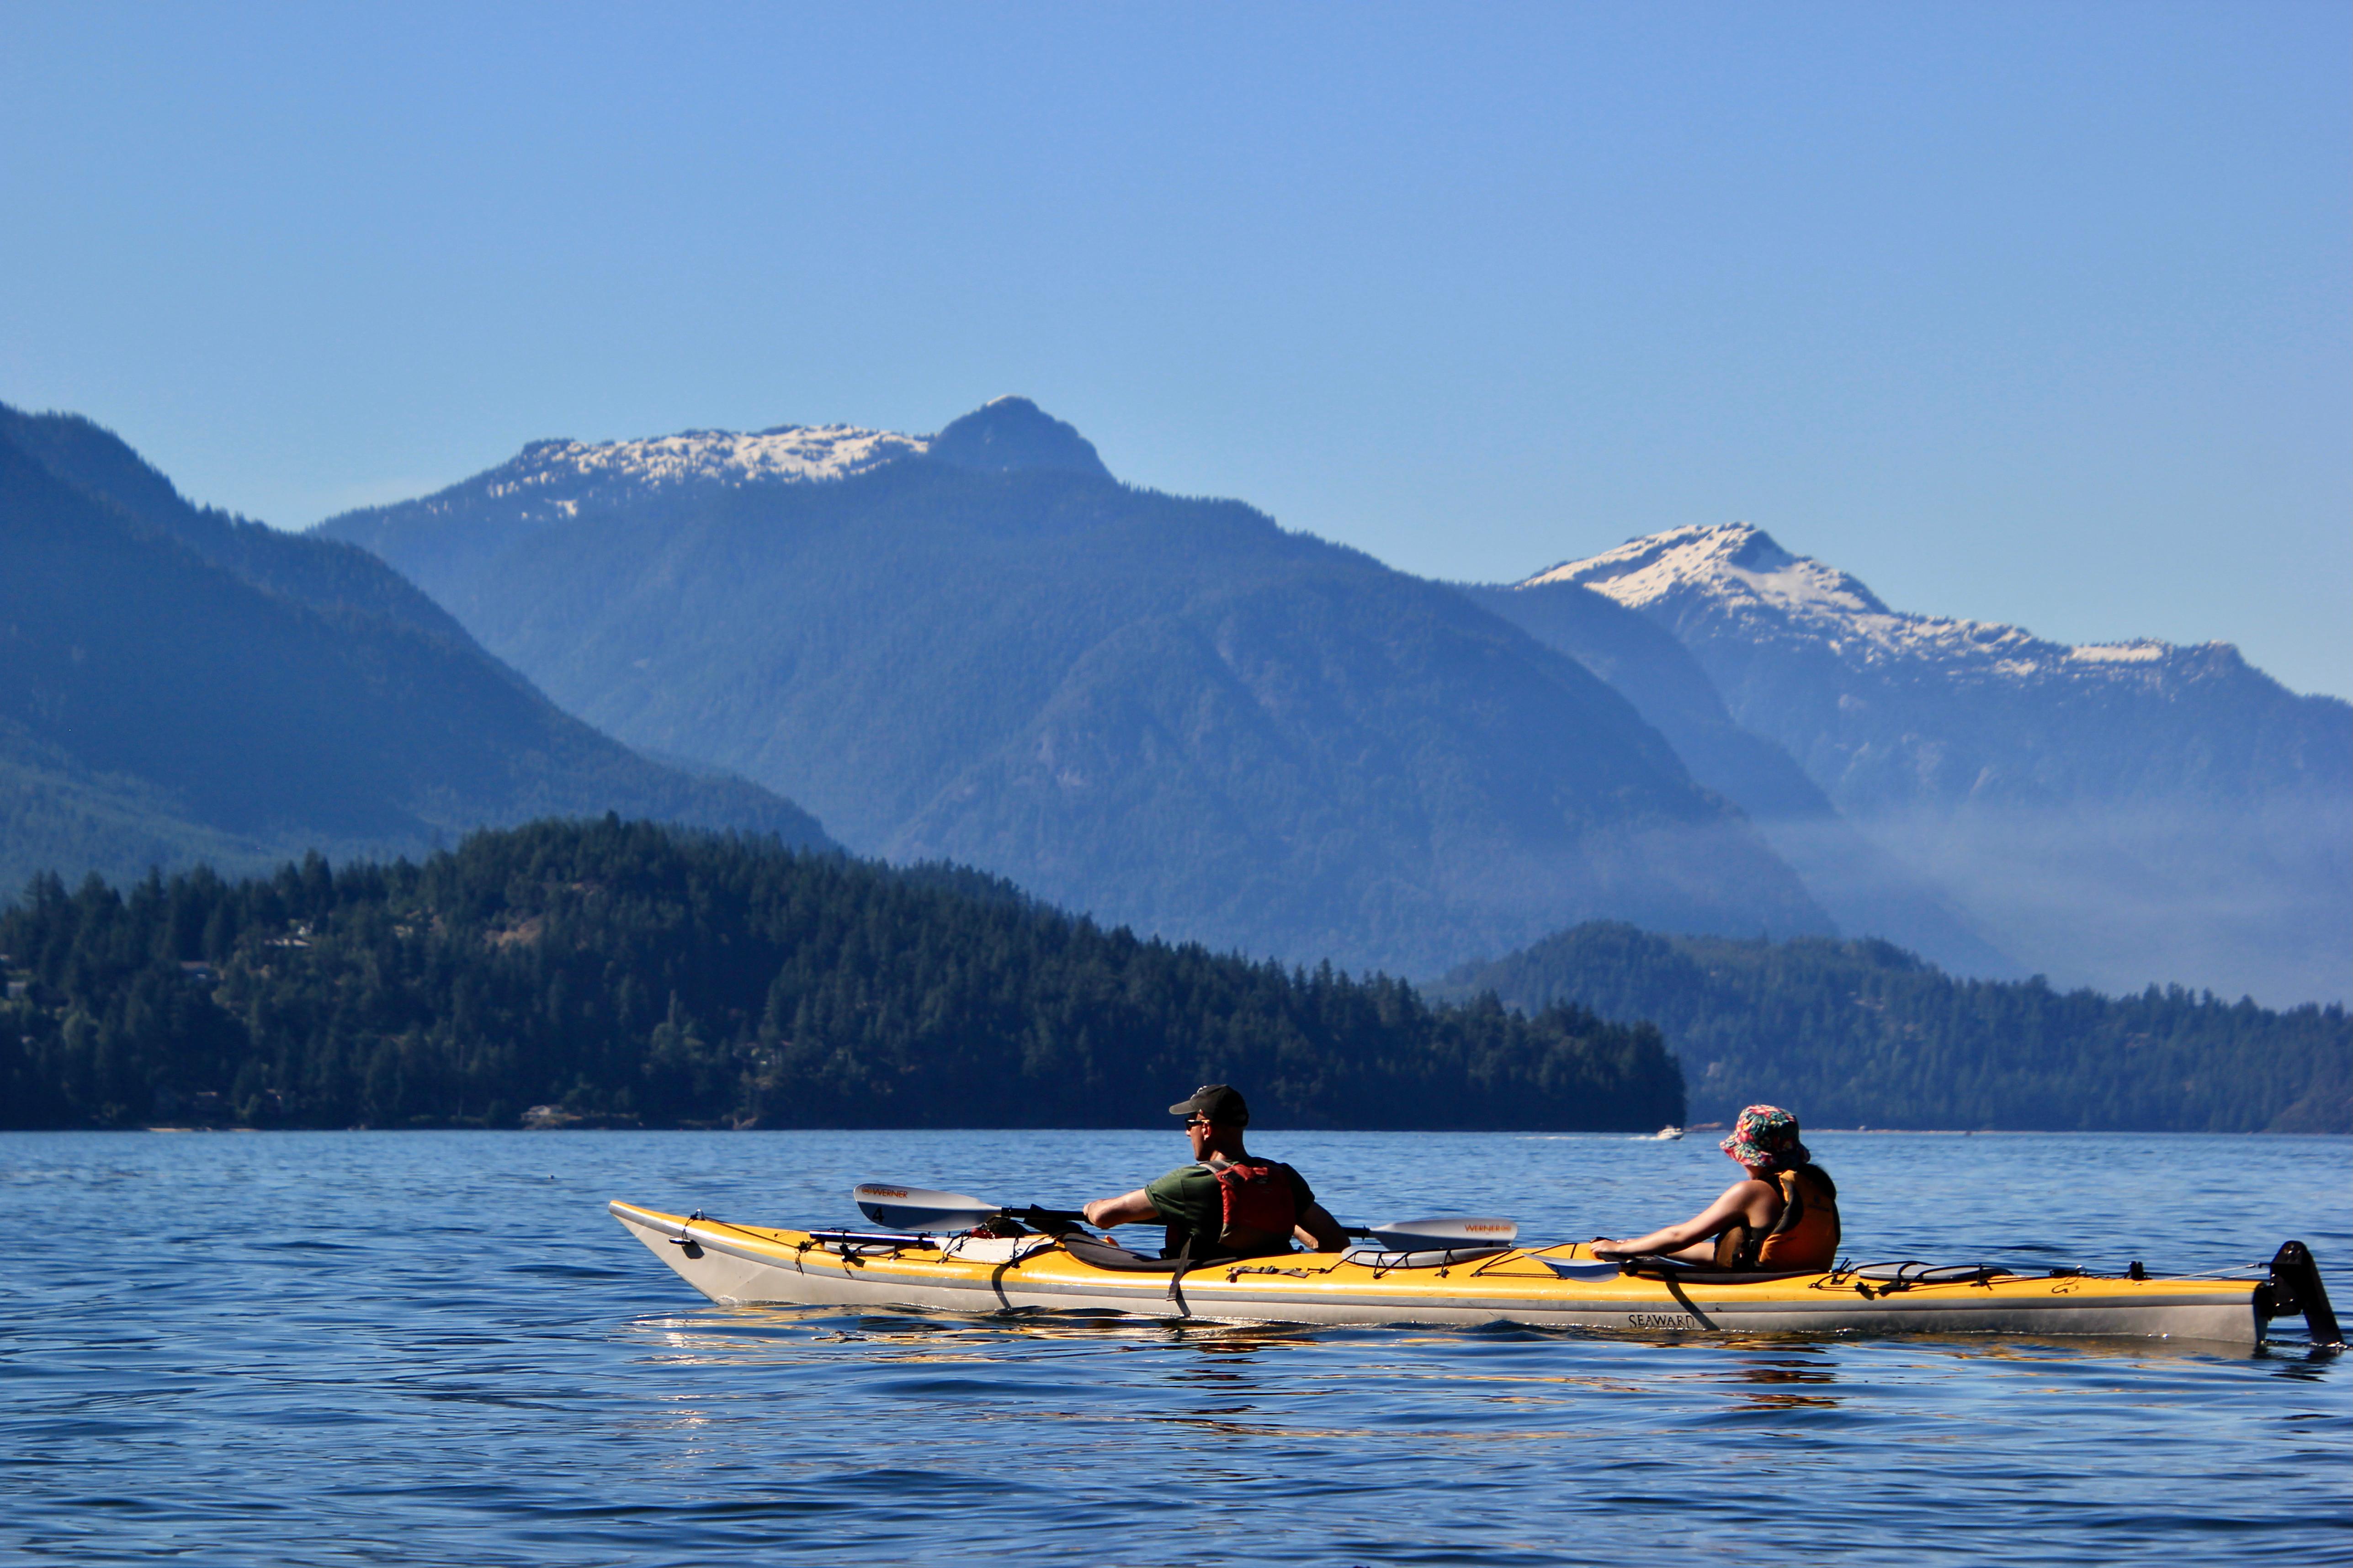 Explore Howe Sound